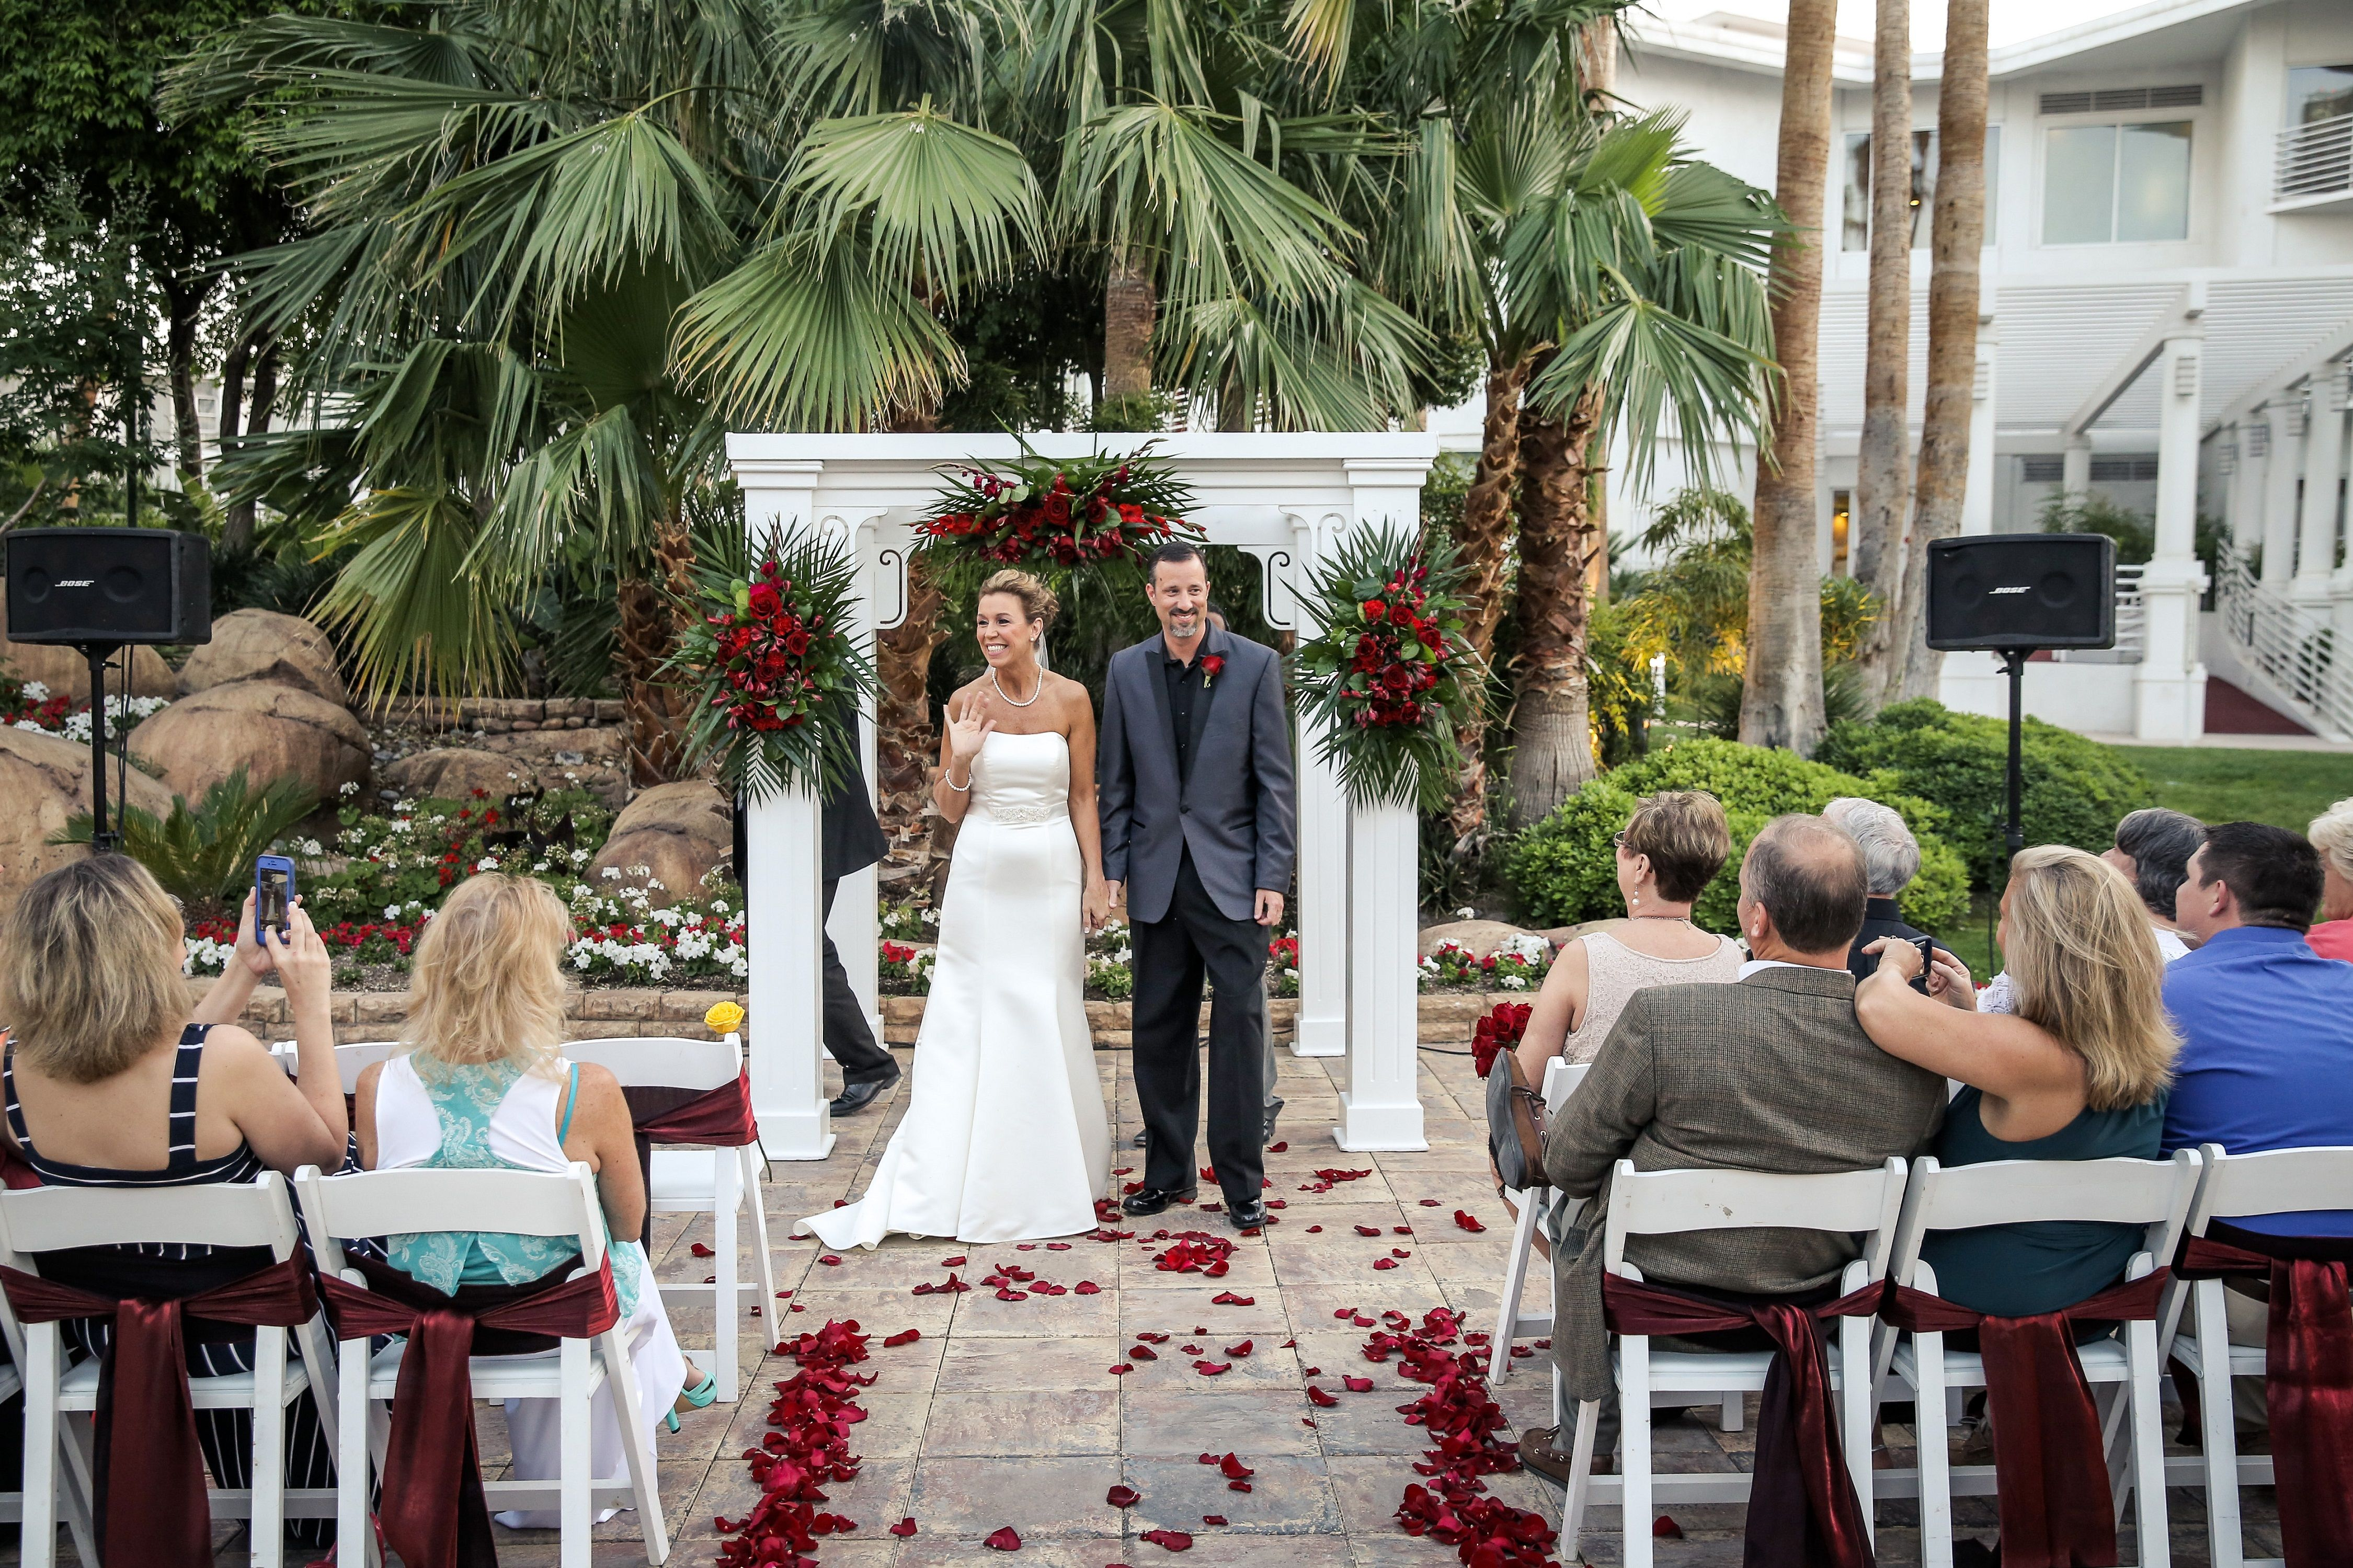 Tropicana Lv Weddings Wedding Flowers Las Vegas Chapel Tropical Chapels